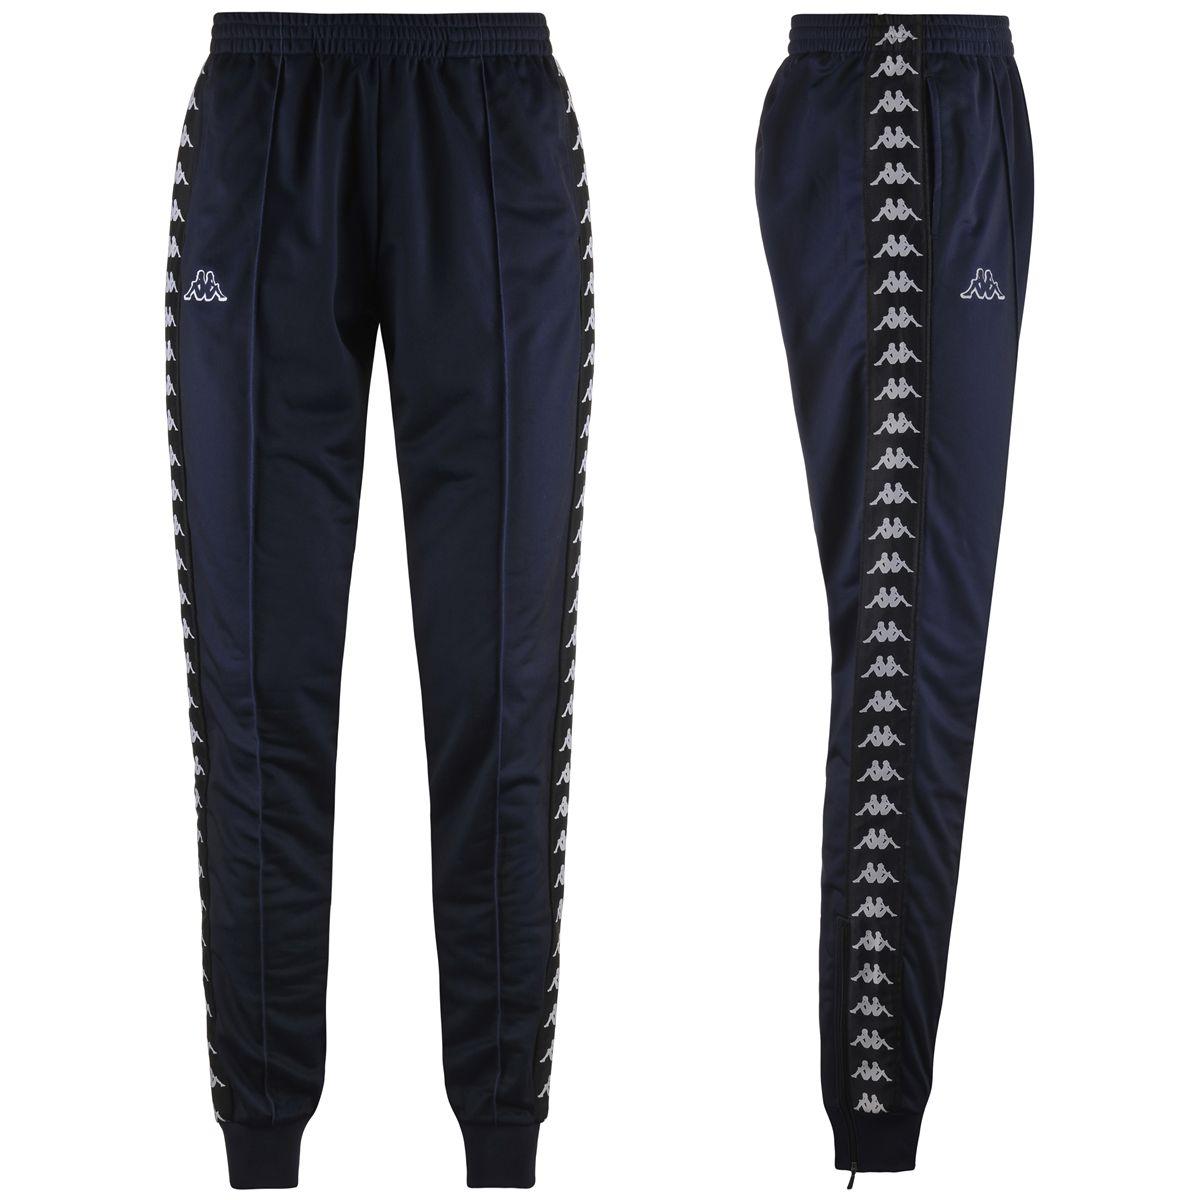 Kappa Pants Junior Boy 222 BANDA RASTORIA SLIM SPORT STREET Sport Trousers